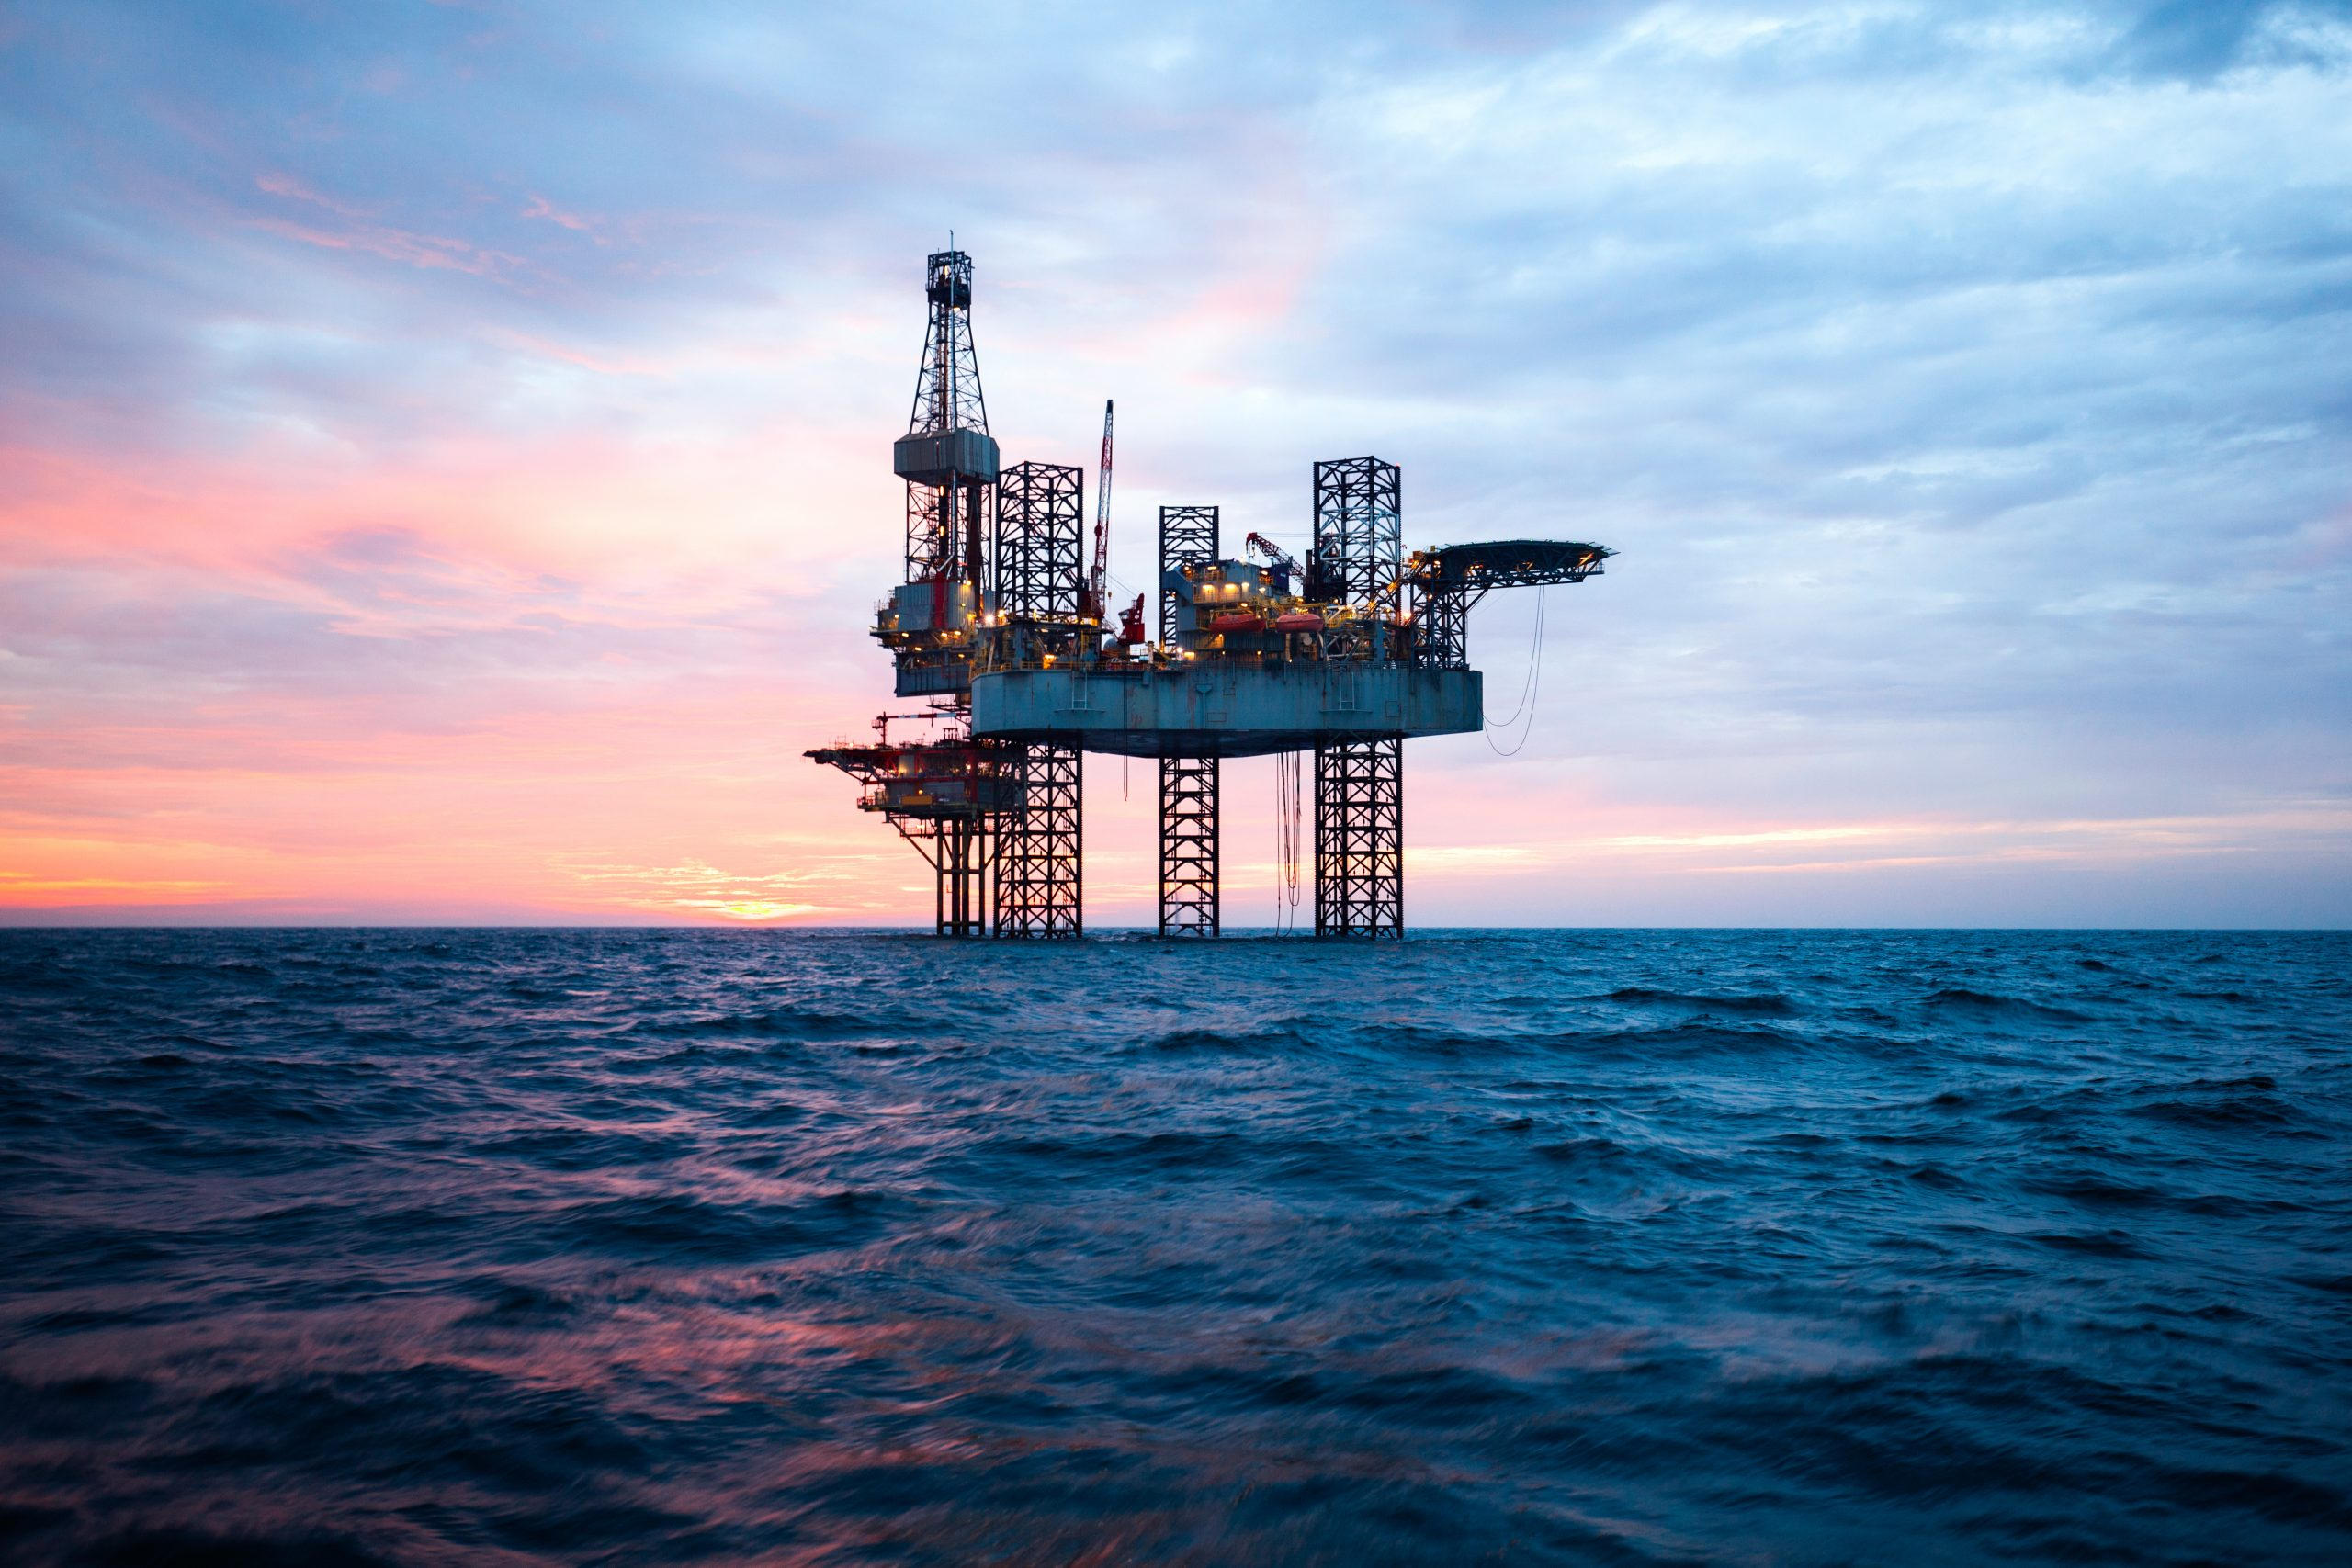 rmda-ss-energy-industry-rig.2560.1707